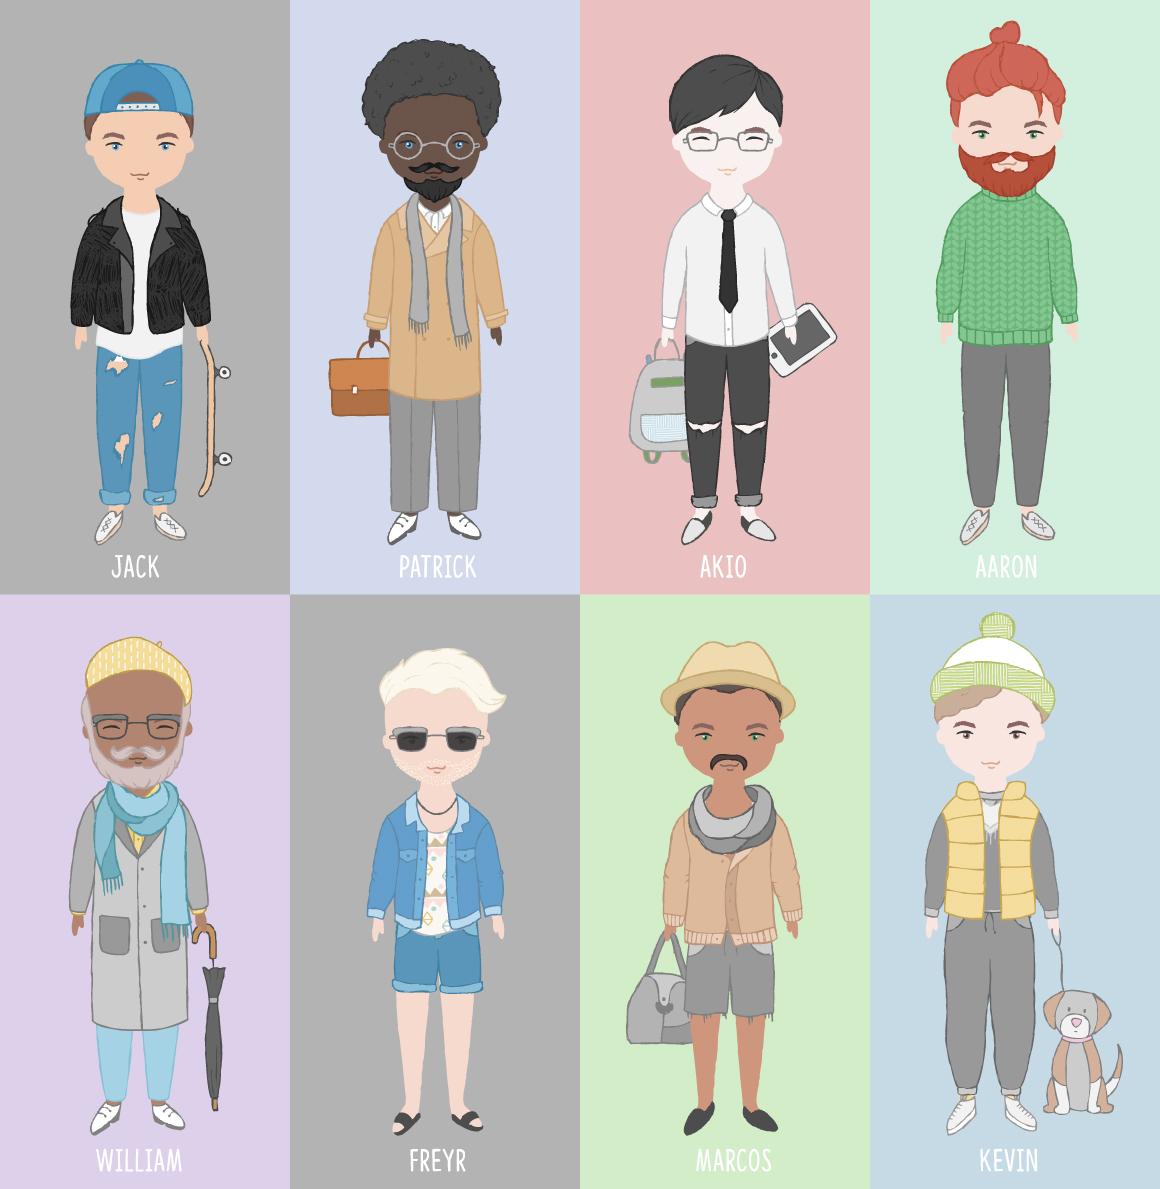 卡通人像头发服装设计矢量素材 Portrait & Character Creator插图(2)